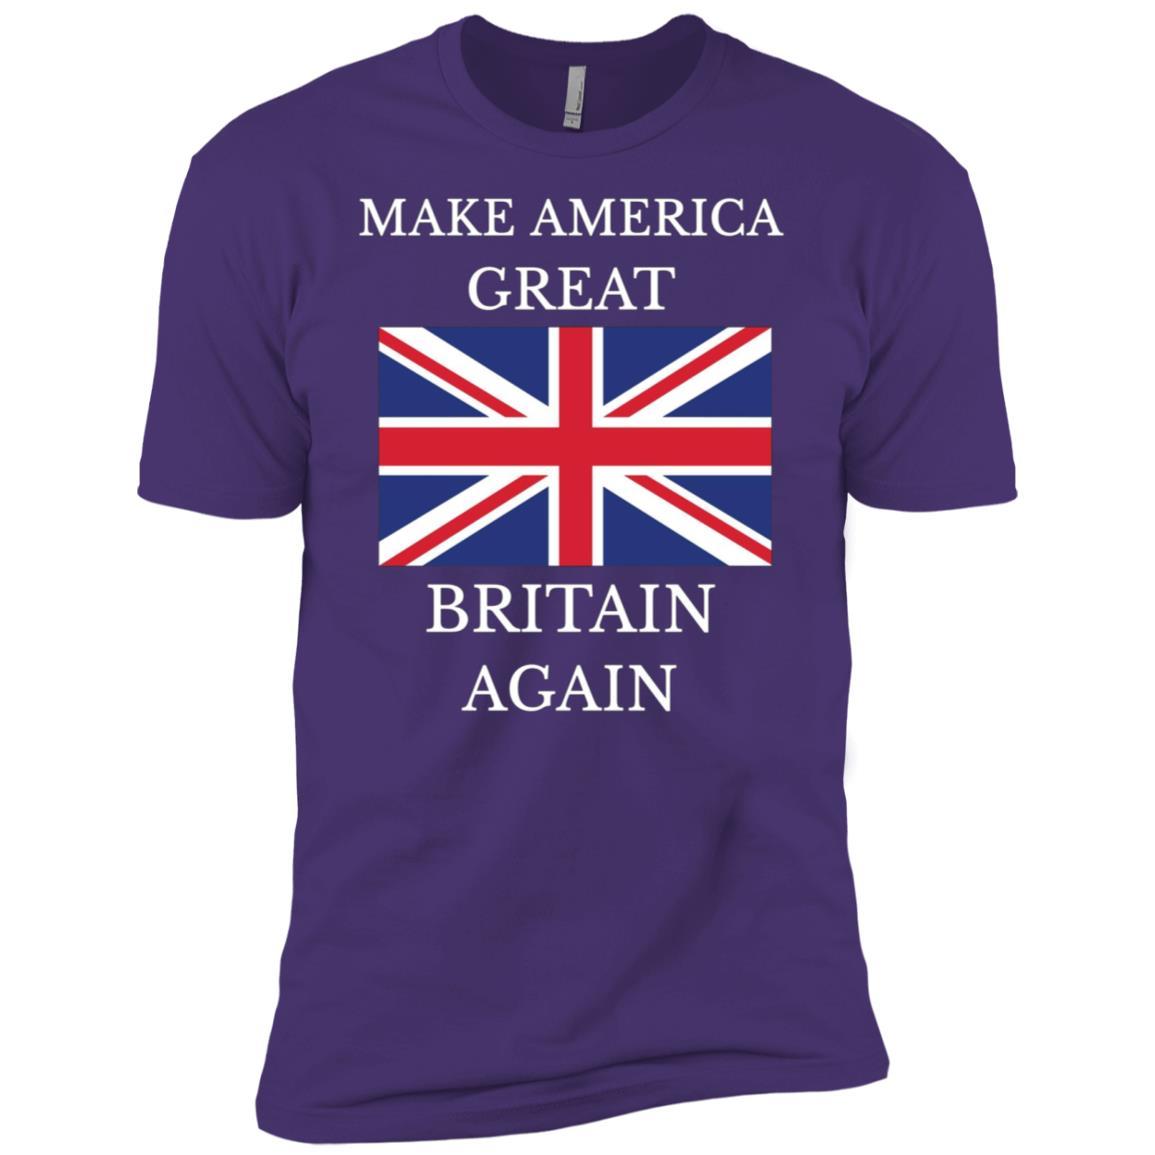 MAKE AMERICA GREAT BRITAIN AGAIN -3 Men Short Sleeve T-Shirt